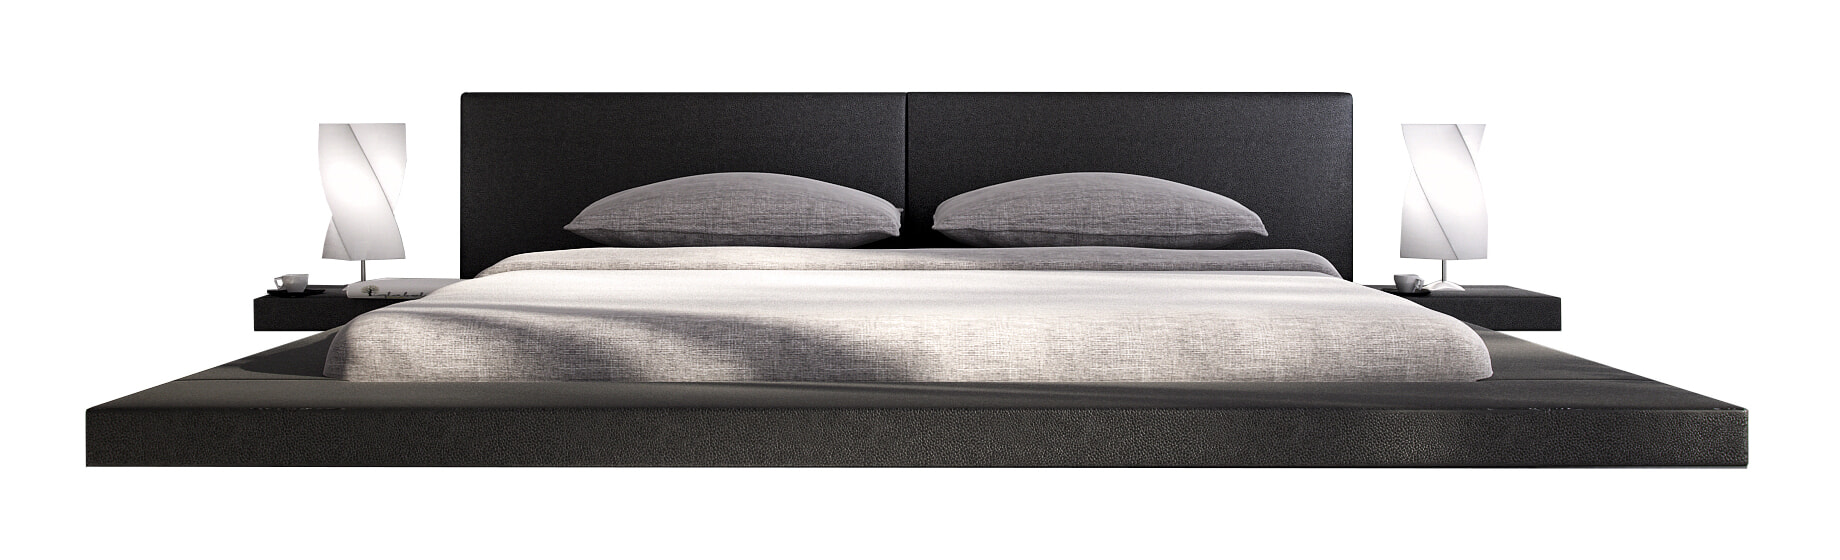 Artistiq Bed 'Renee' 140 x 200cm, kleur Zwart